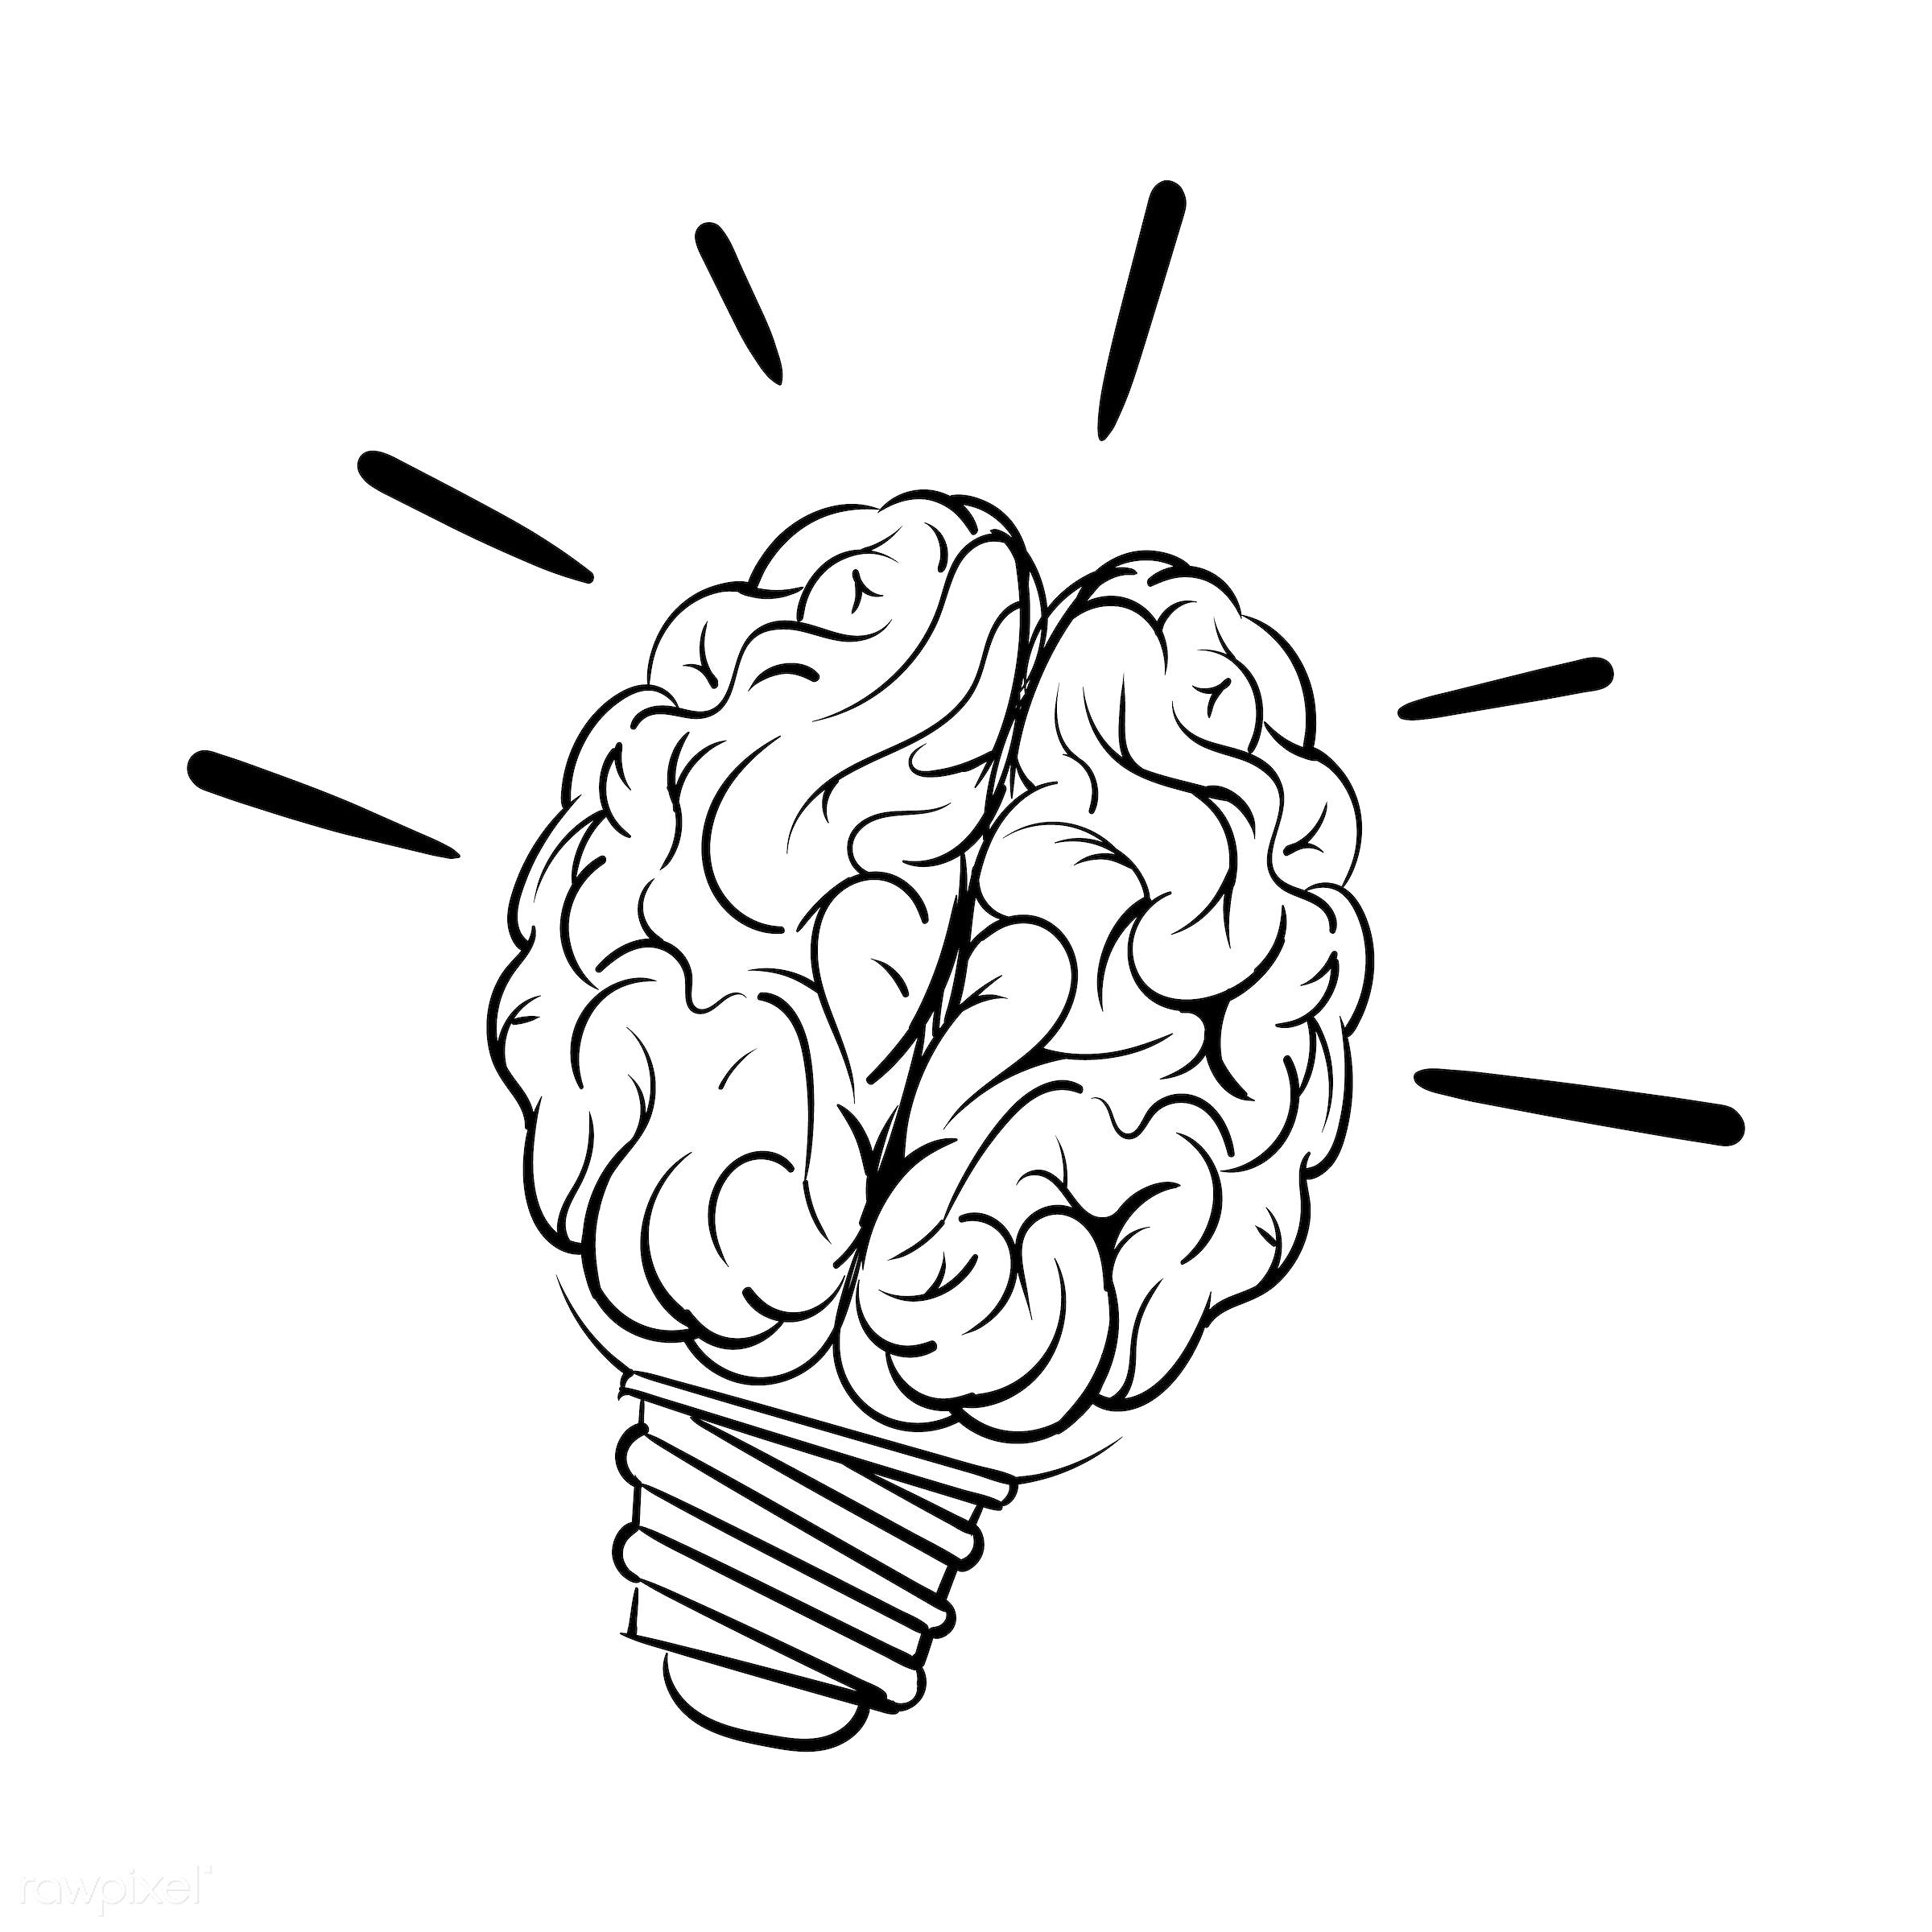 Hand drawn lightbulb creative ideas - brain, art, artwork, attitude, brainstorm, creative, design, draw, drawing, drawn,...